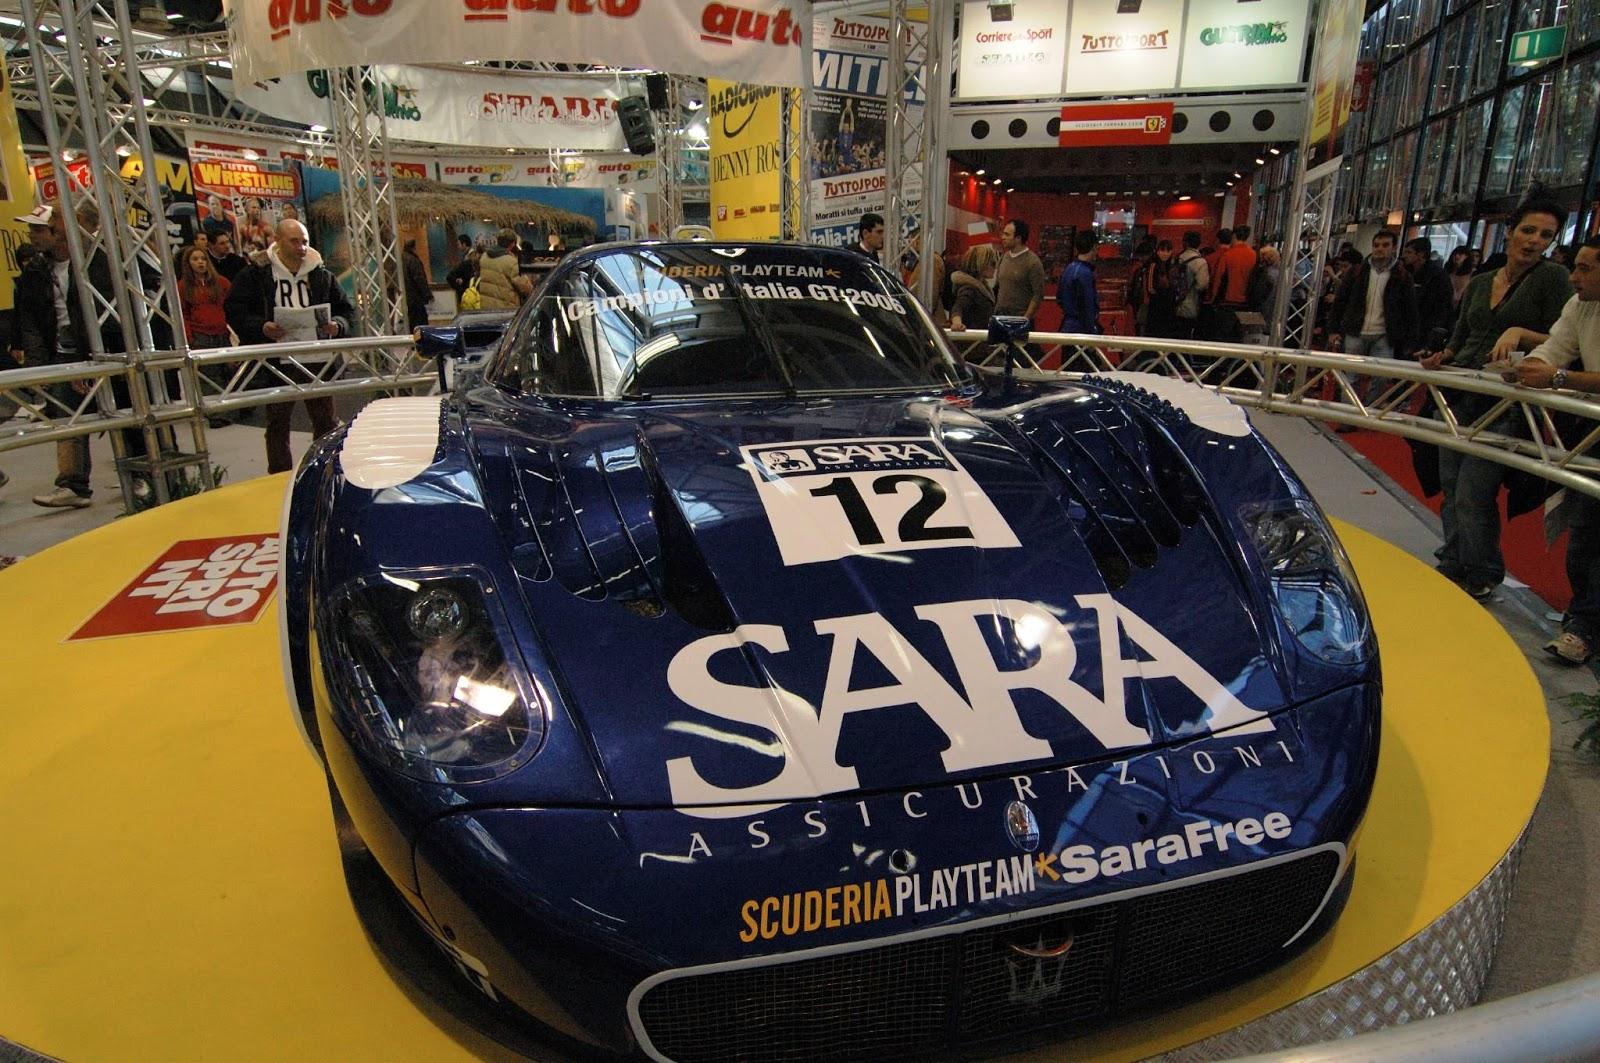 MC12 race car front Maserati MC12. Η Enzo Aperta. Maserati, Maserati MC12, MC12, retrocar, retrocar sunday, zblog